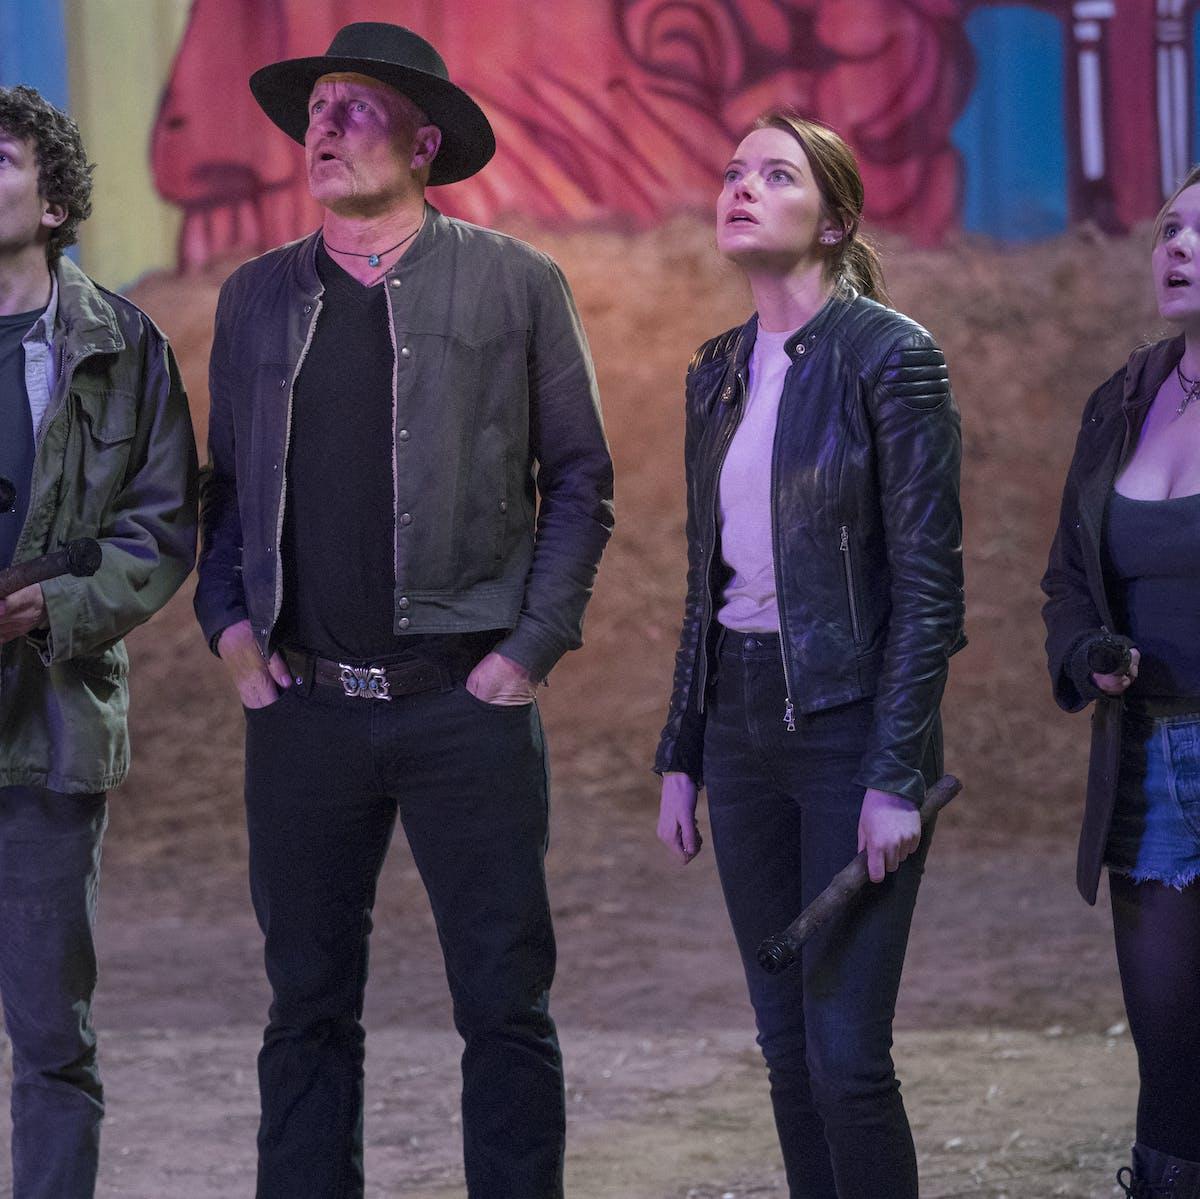 'Zombieland: Double Tap' has a wild Bill Murray post-credits scene